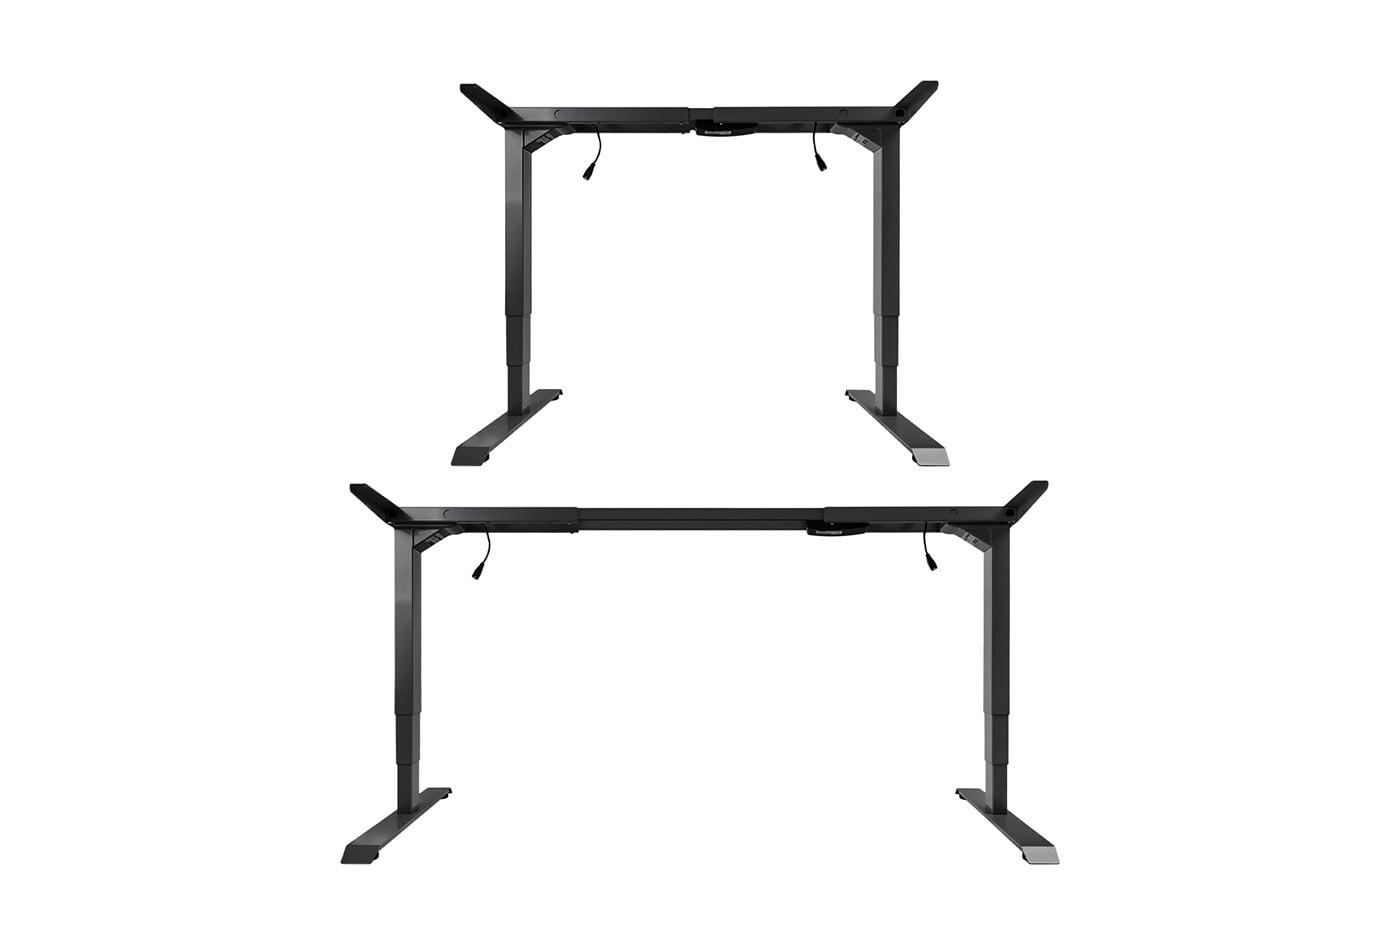 stelaz-biurka-proplus2